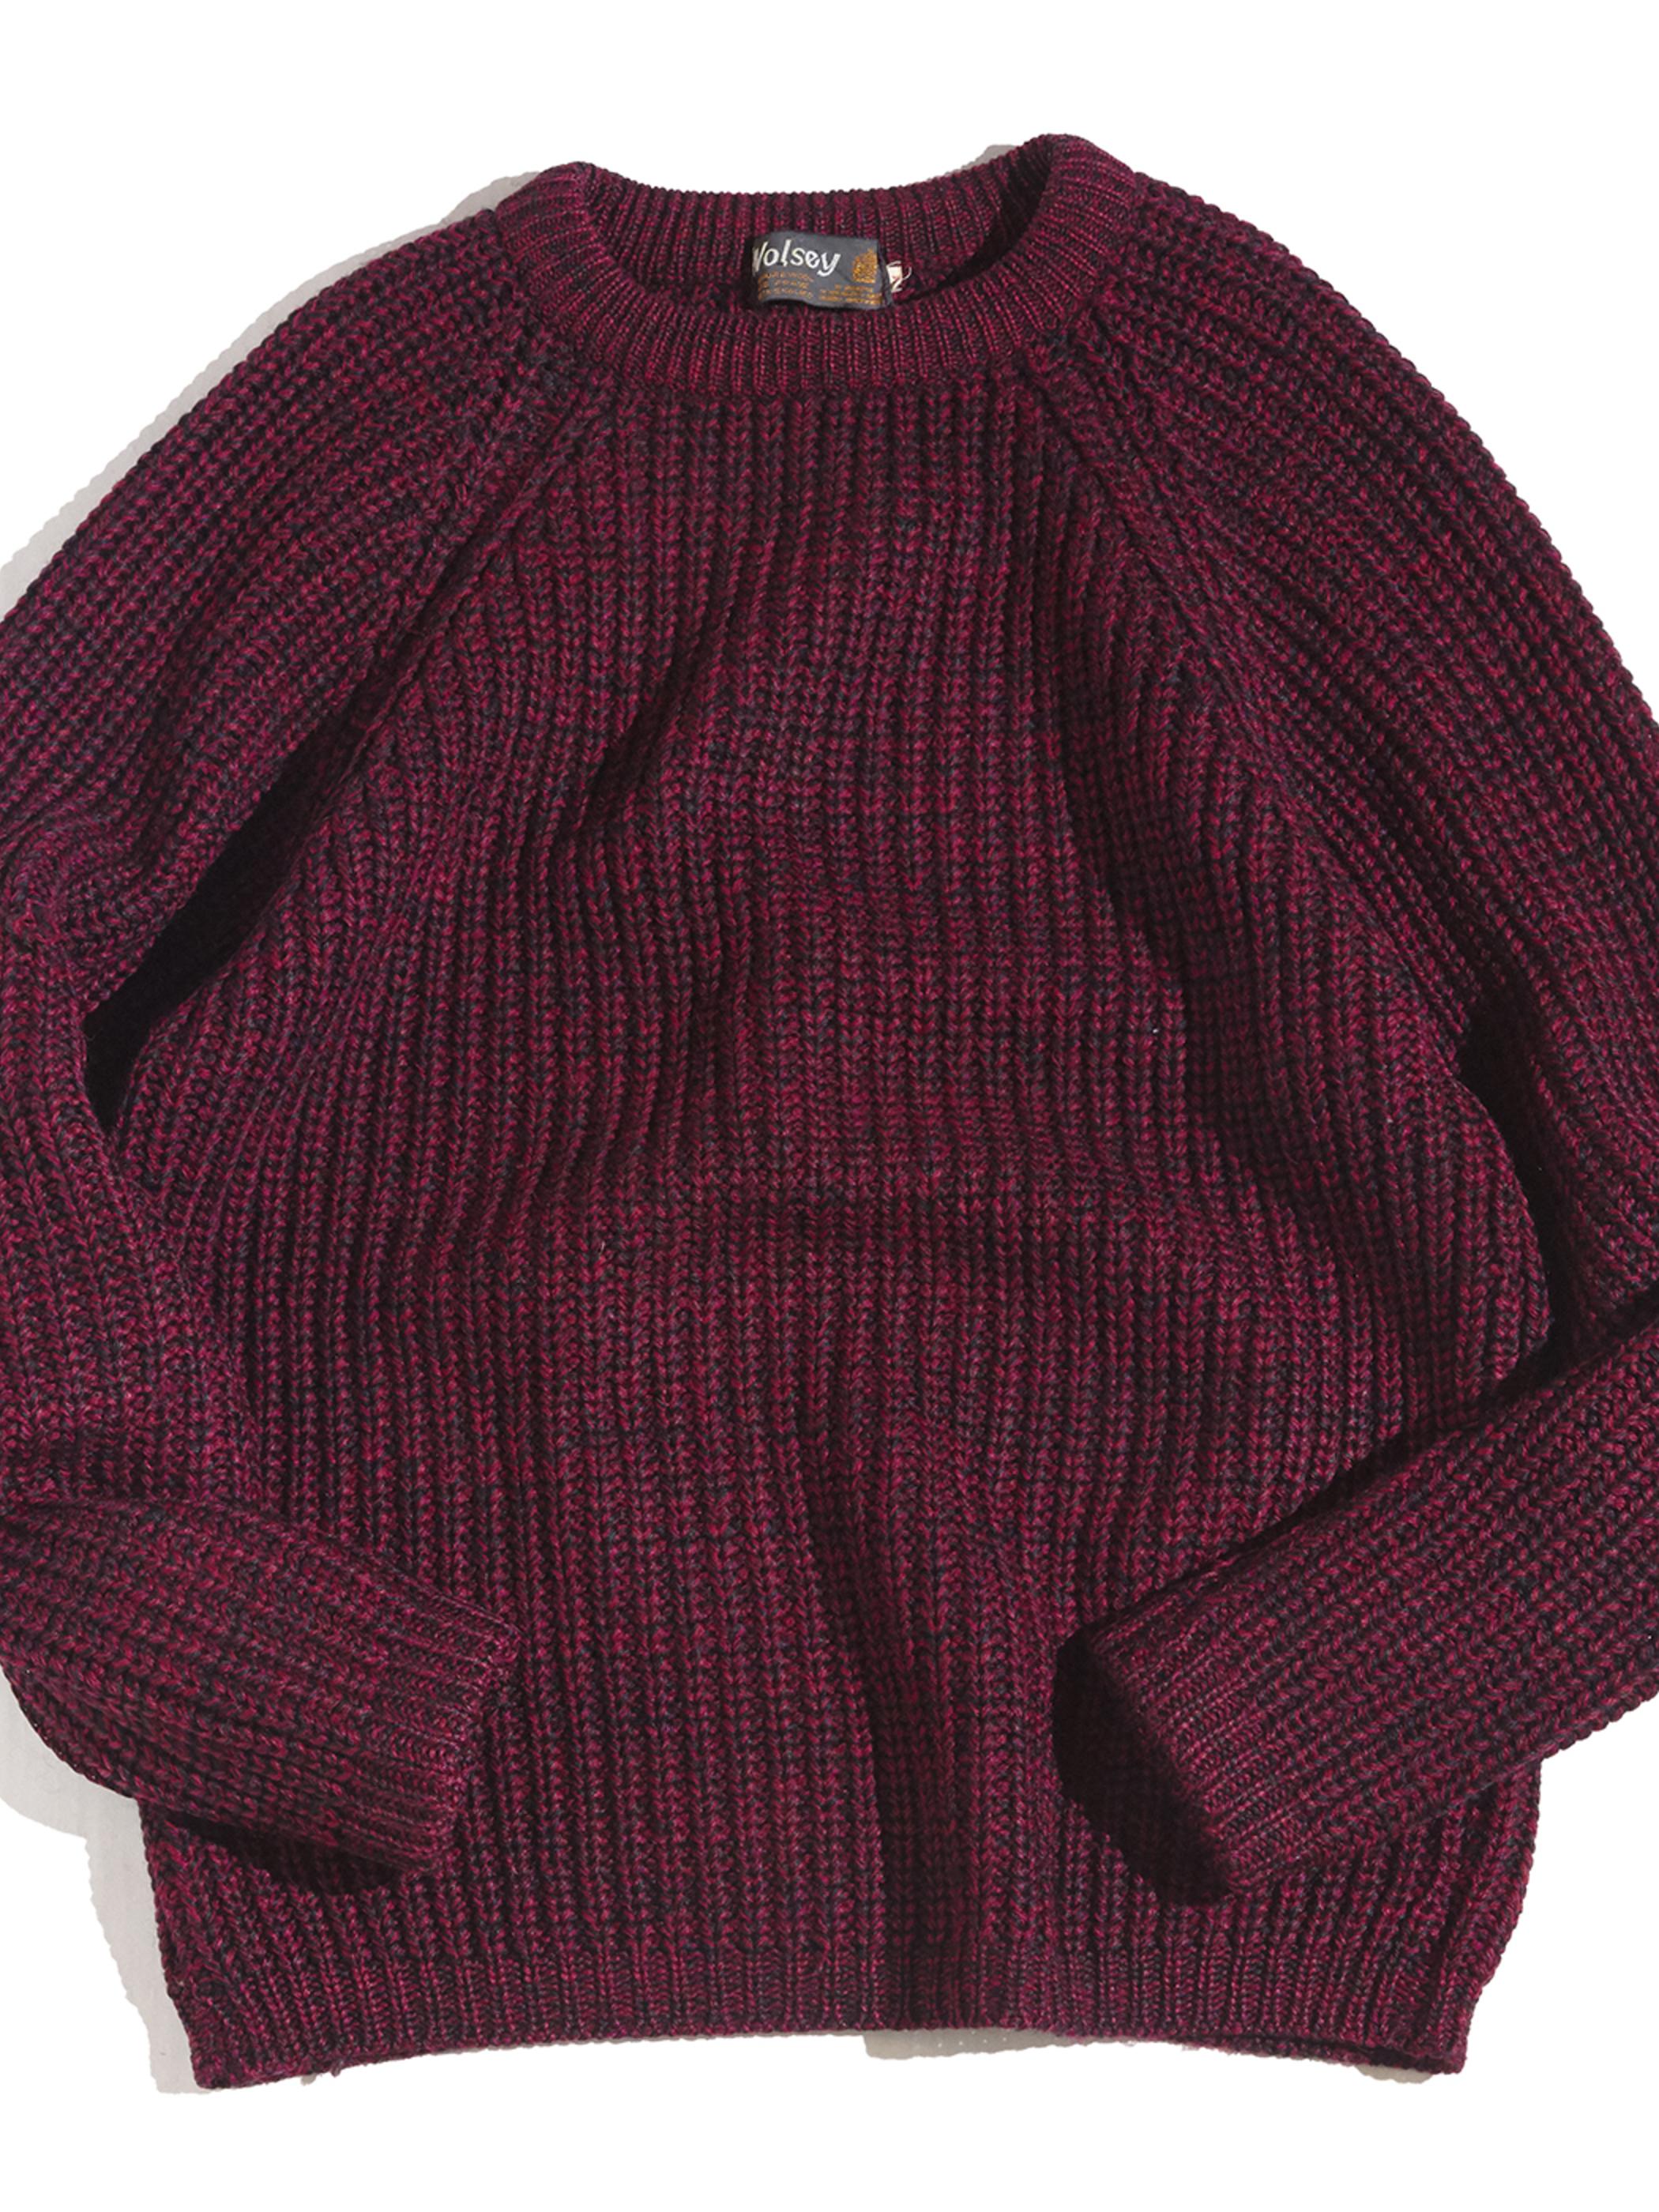 "1970s ""Wolsey"" bulky wool knit sweater -BURGUNDY-"